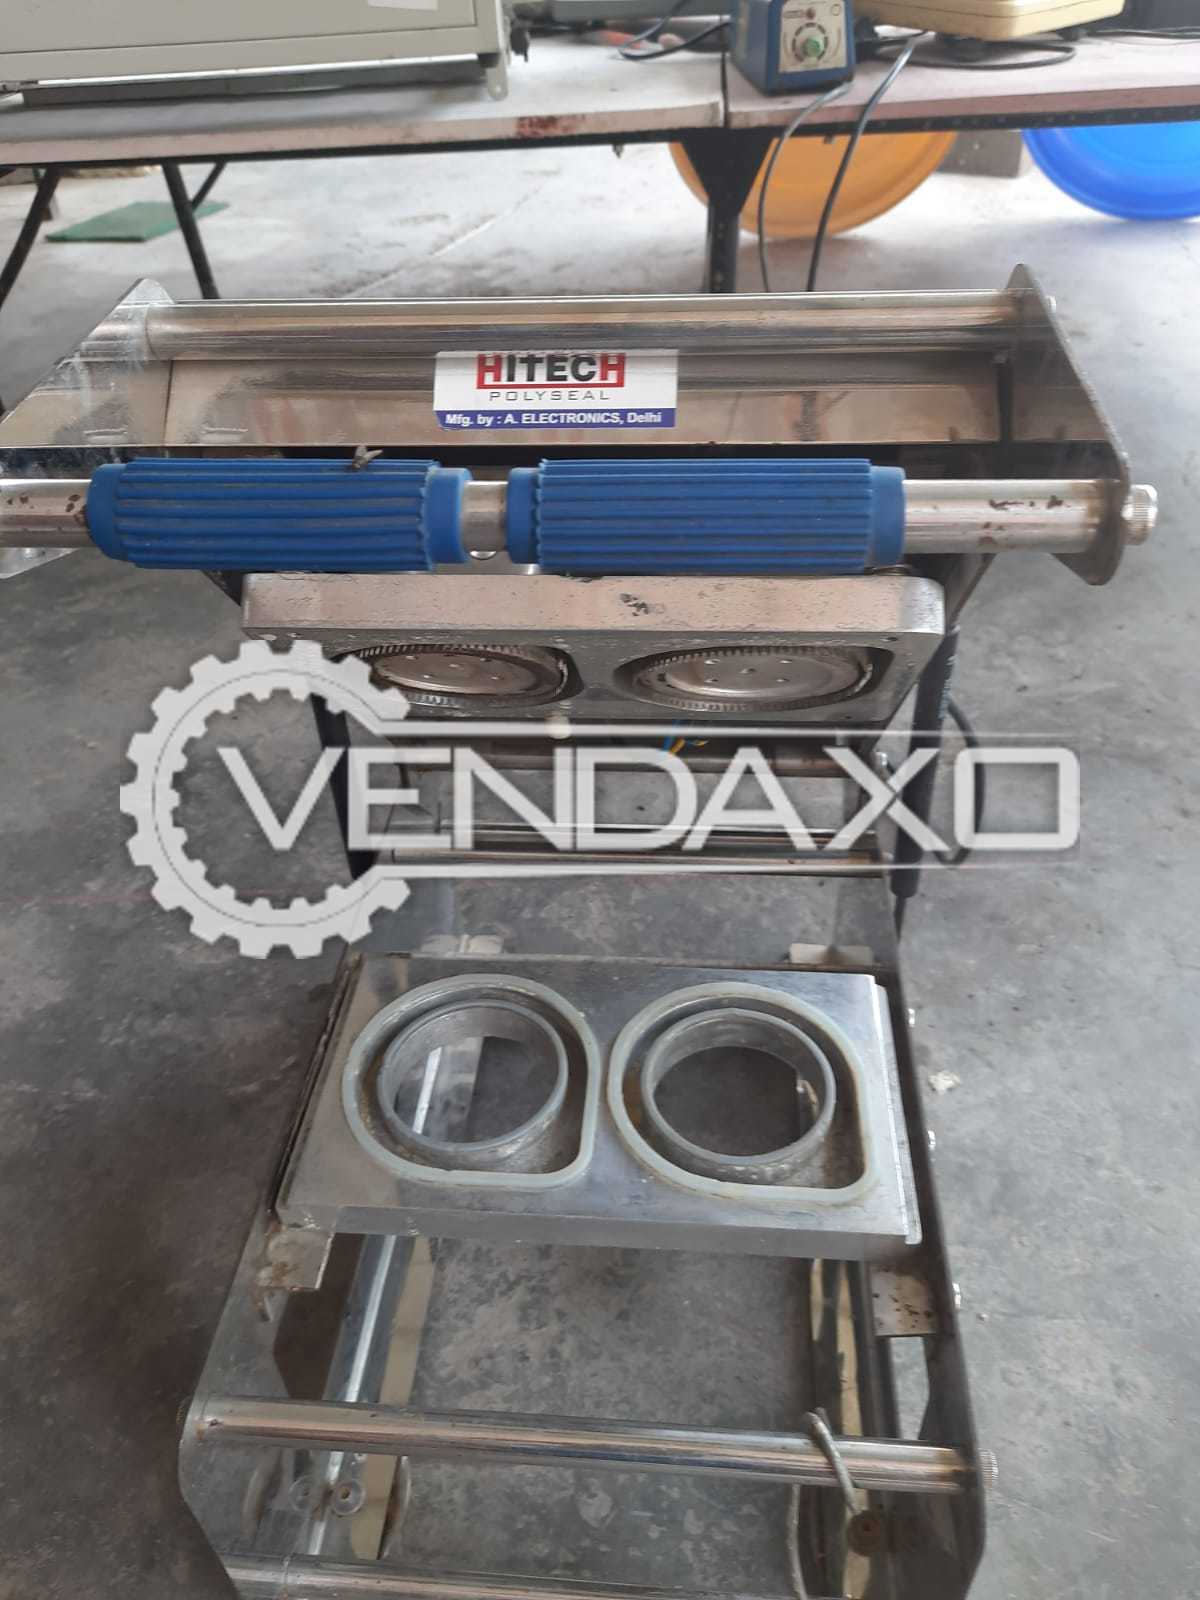 Hi Tech Cup Sealer Machine - Power - 300 to 400 Watt